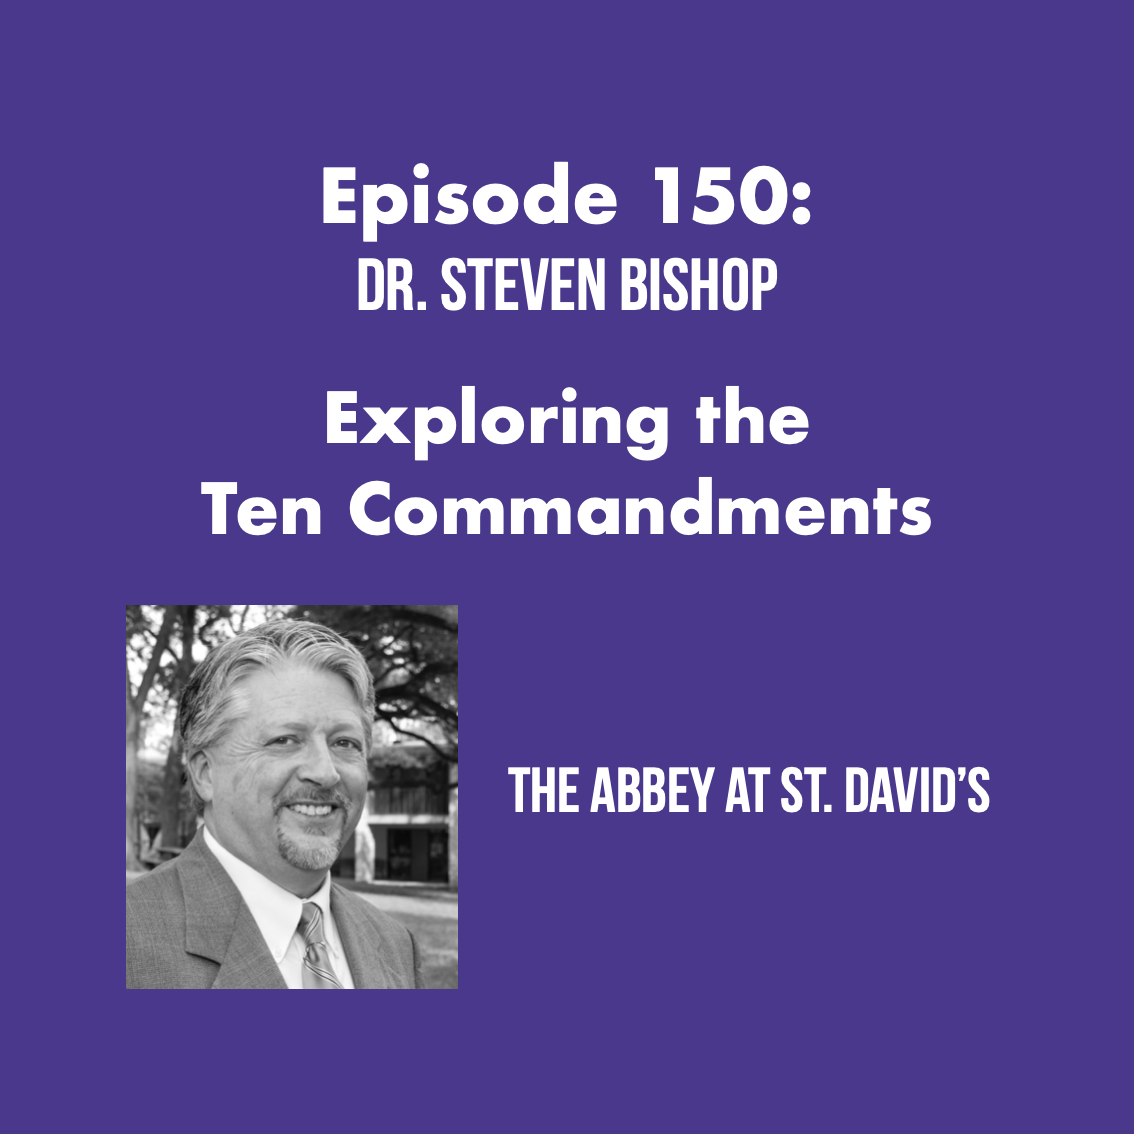 Episode 150: Exploring the Ten Commandments with Dr. Steven Bishop